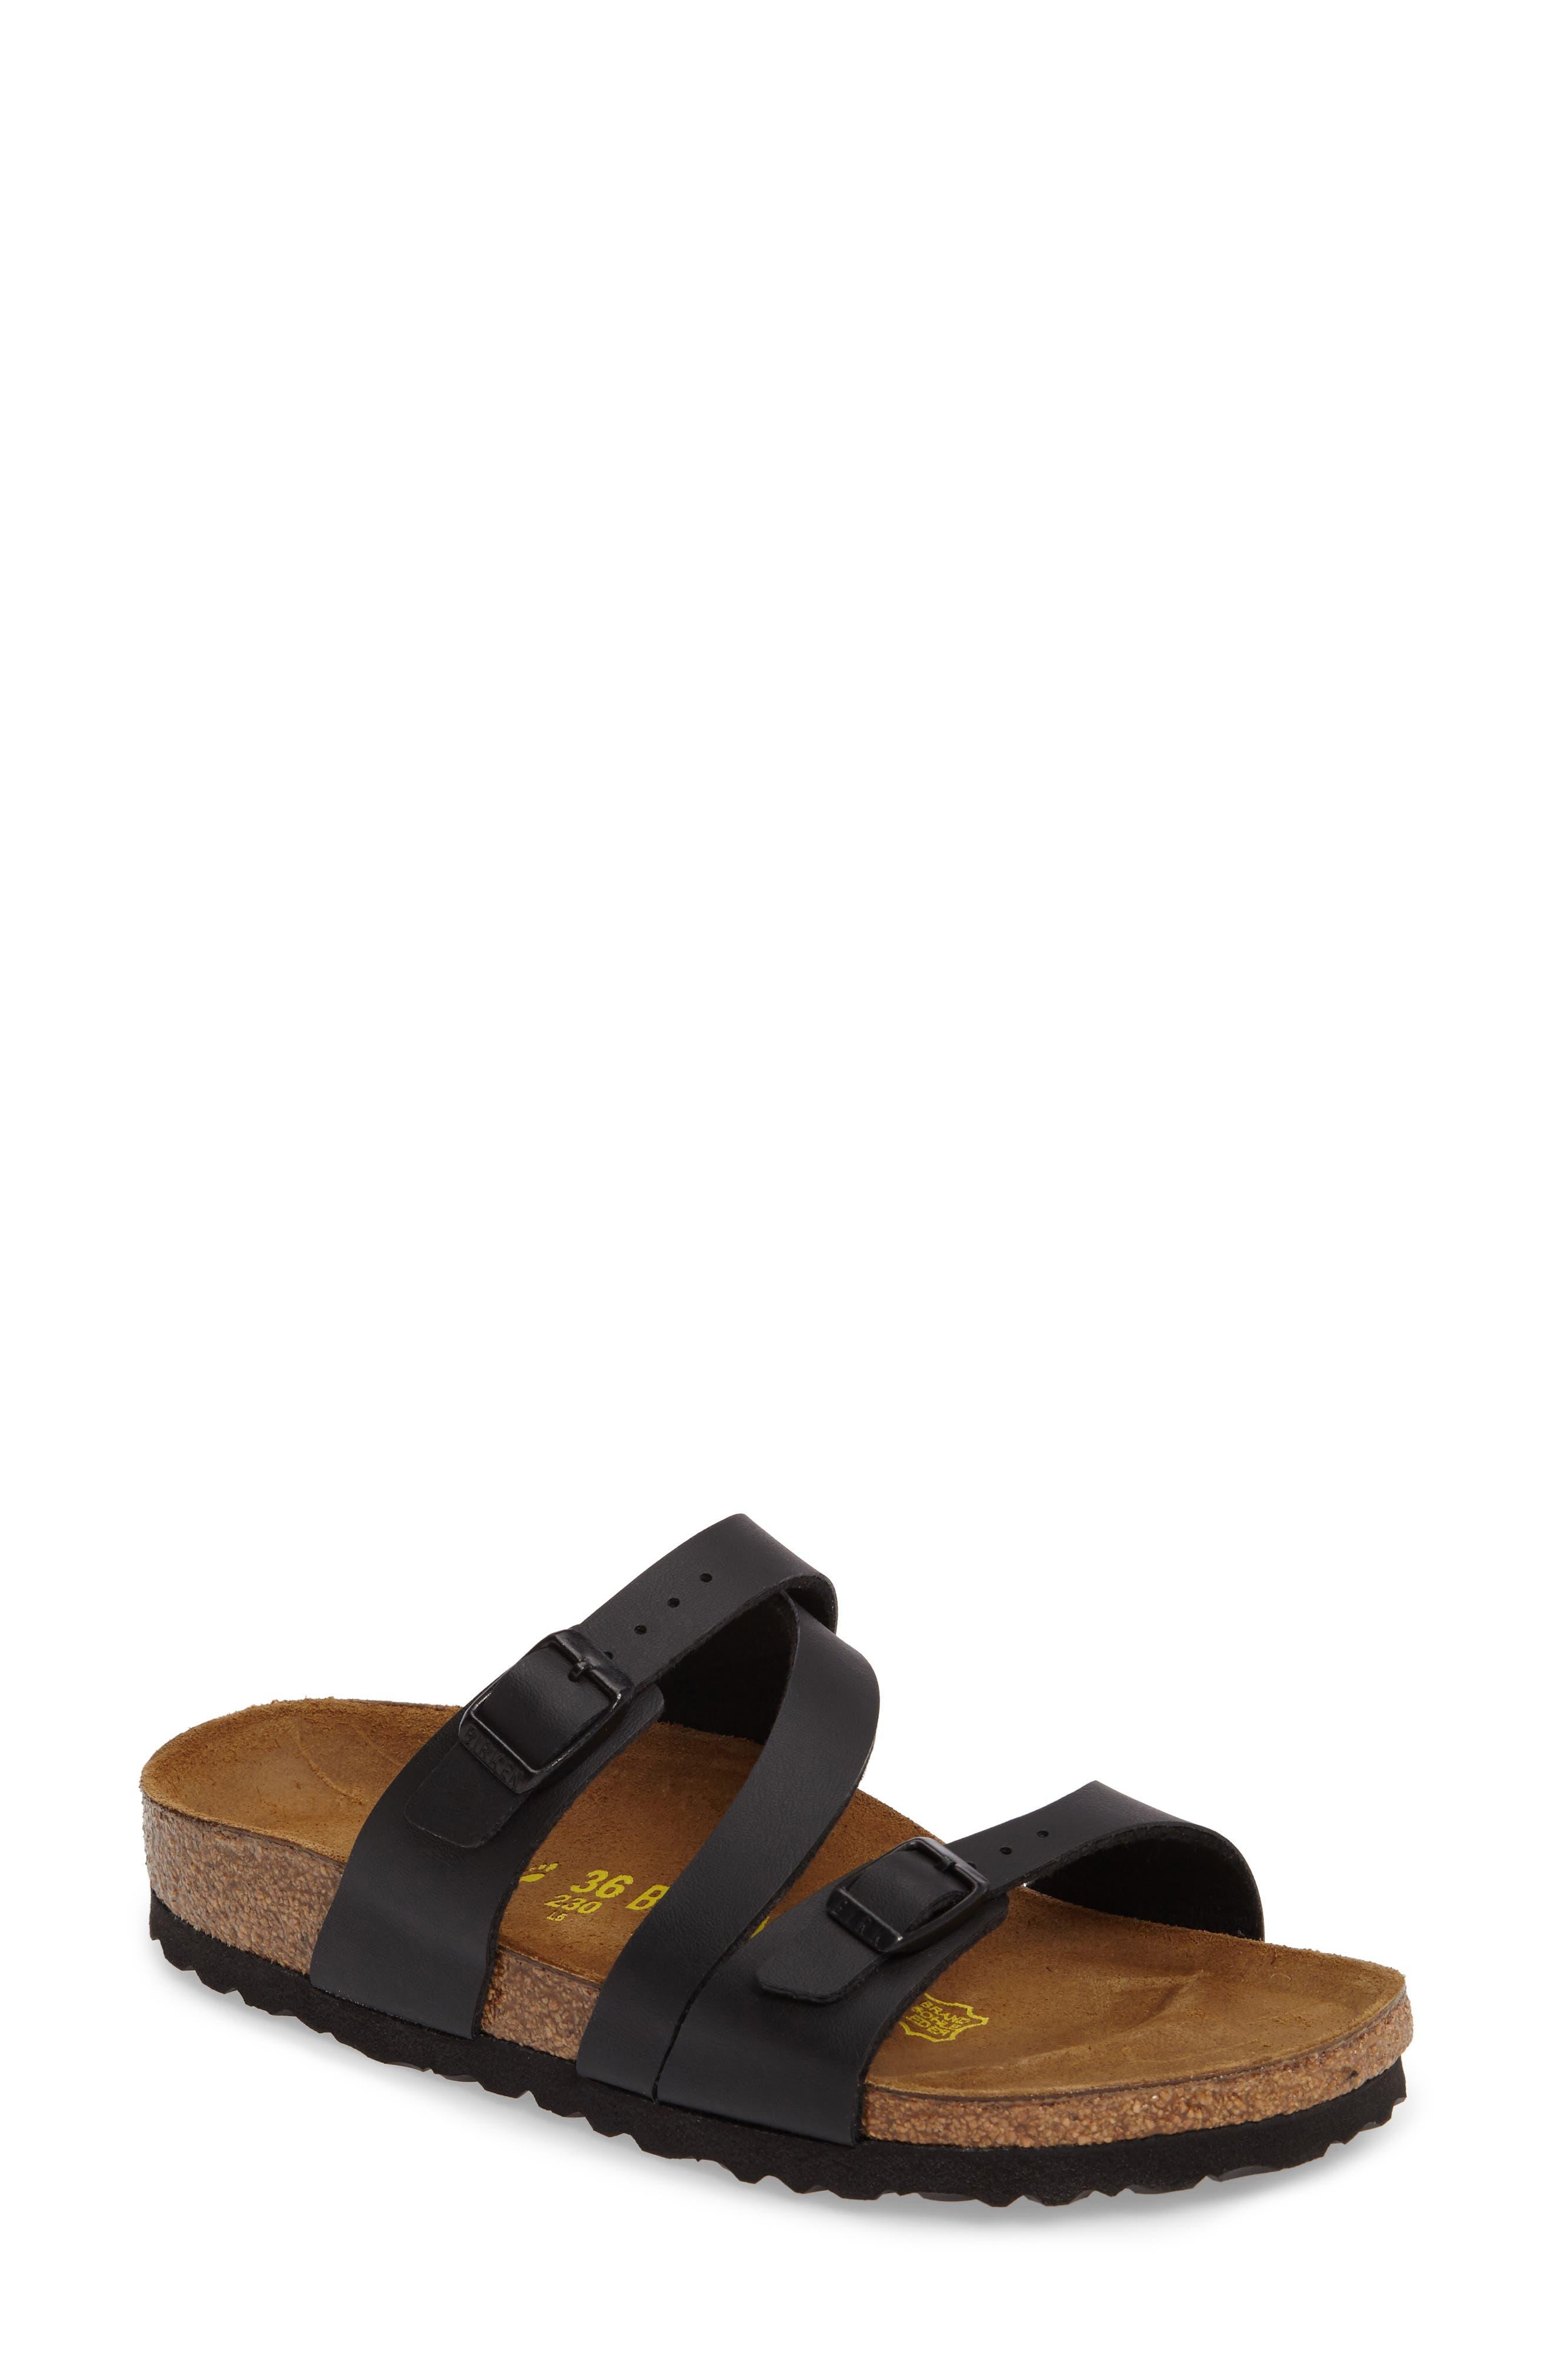 Alternate Image 1 Selected - Birkenstock Salina Slide Sandal (Women)